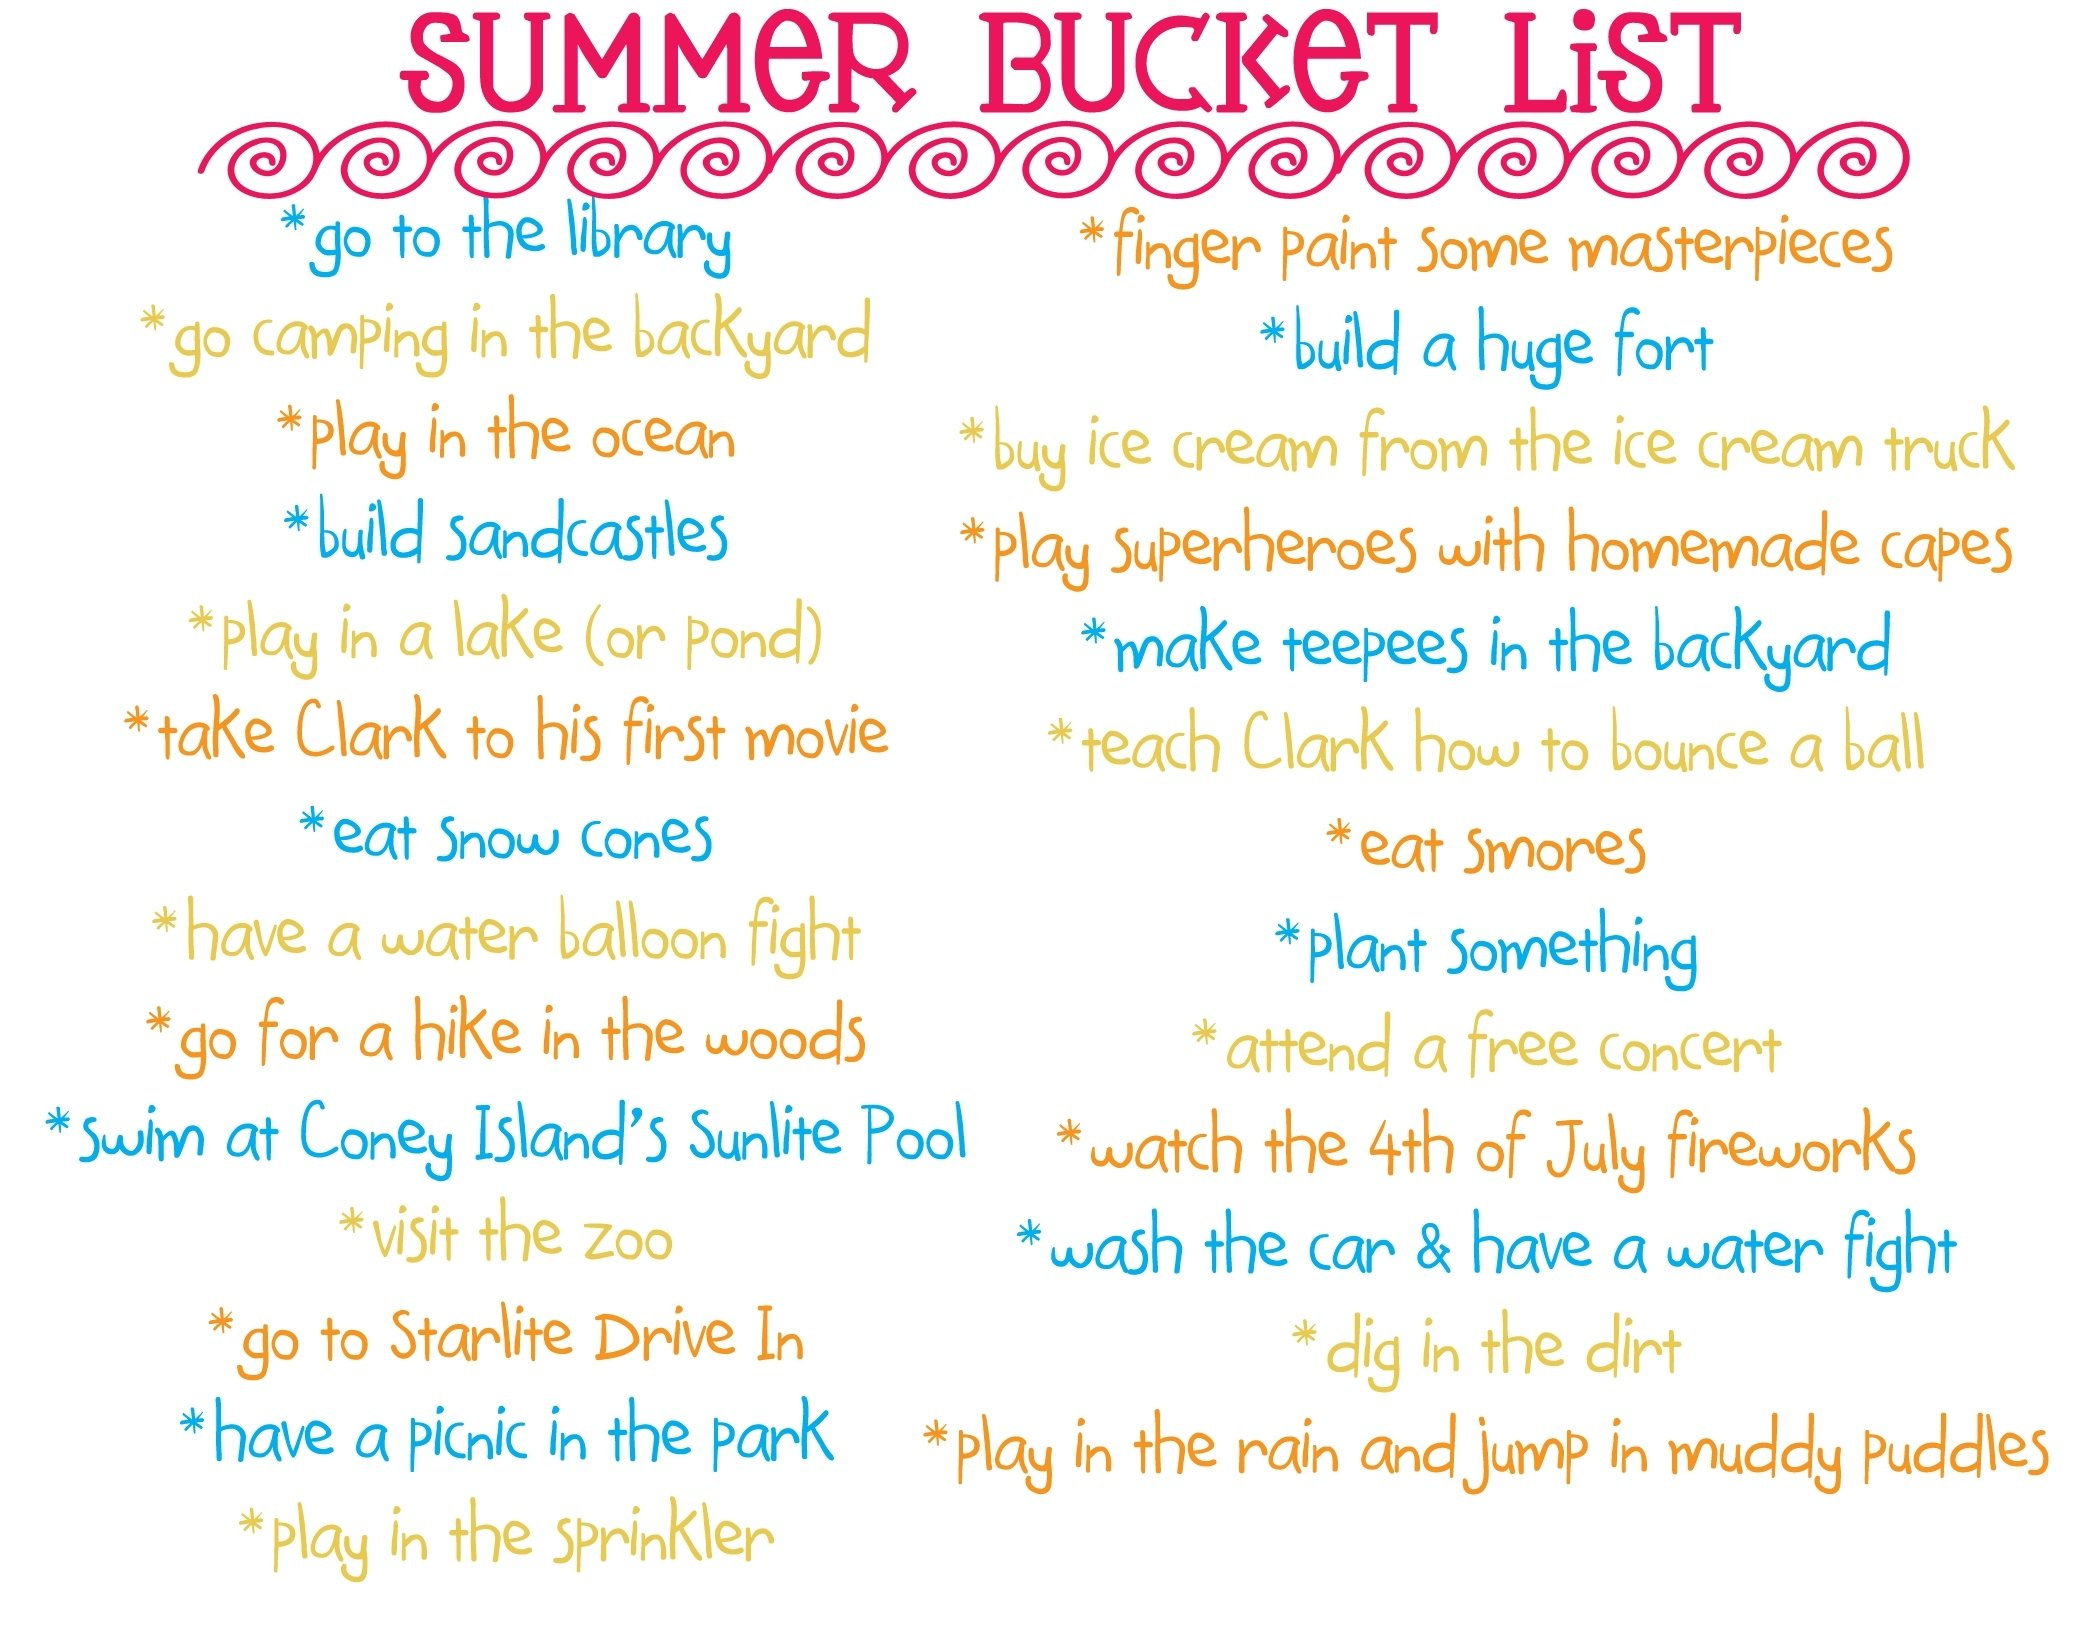 10 Attractive Fun Summer Bucket List Ideas summer bucket list 2012 two blue pillars 3 2020